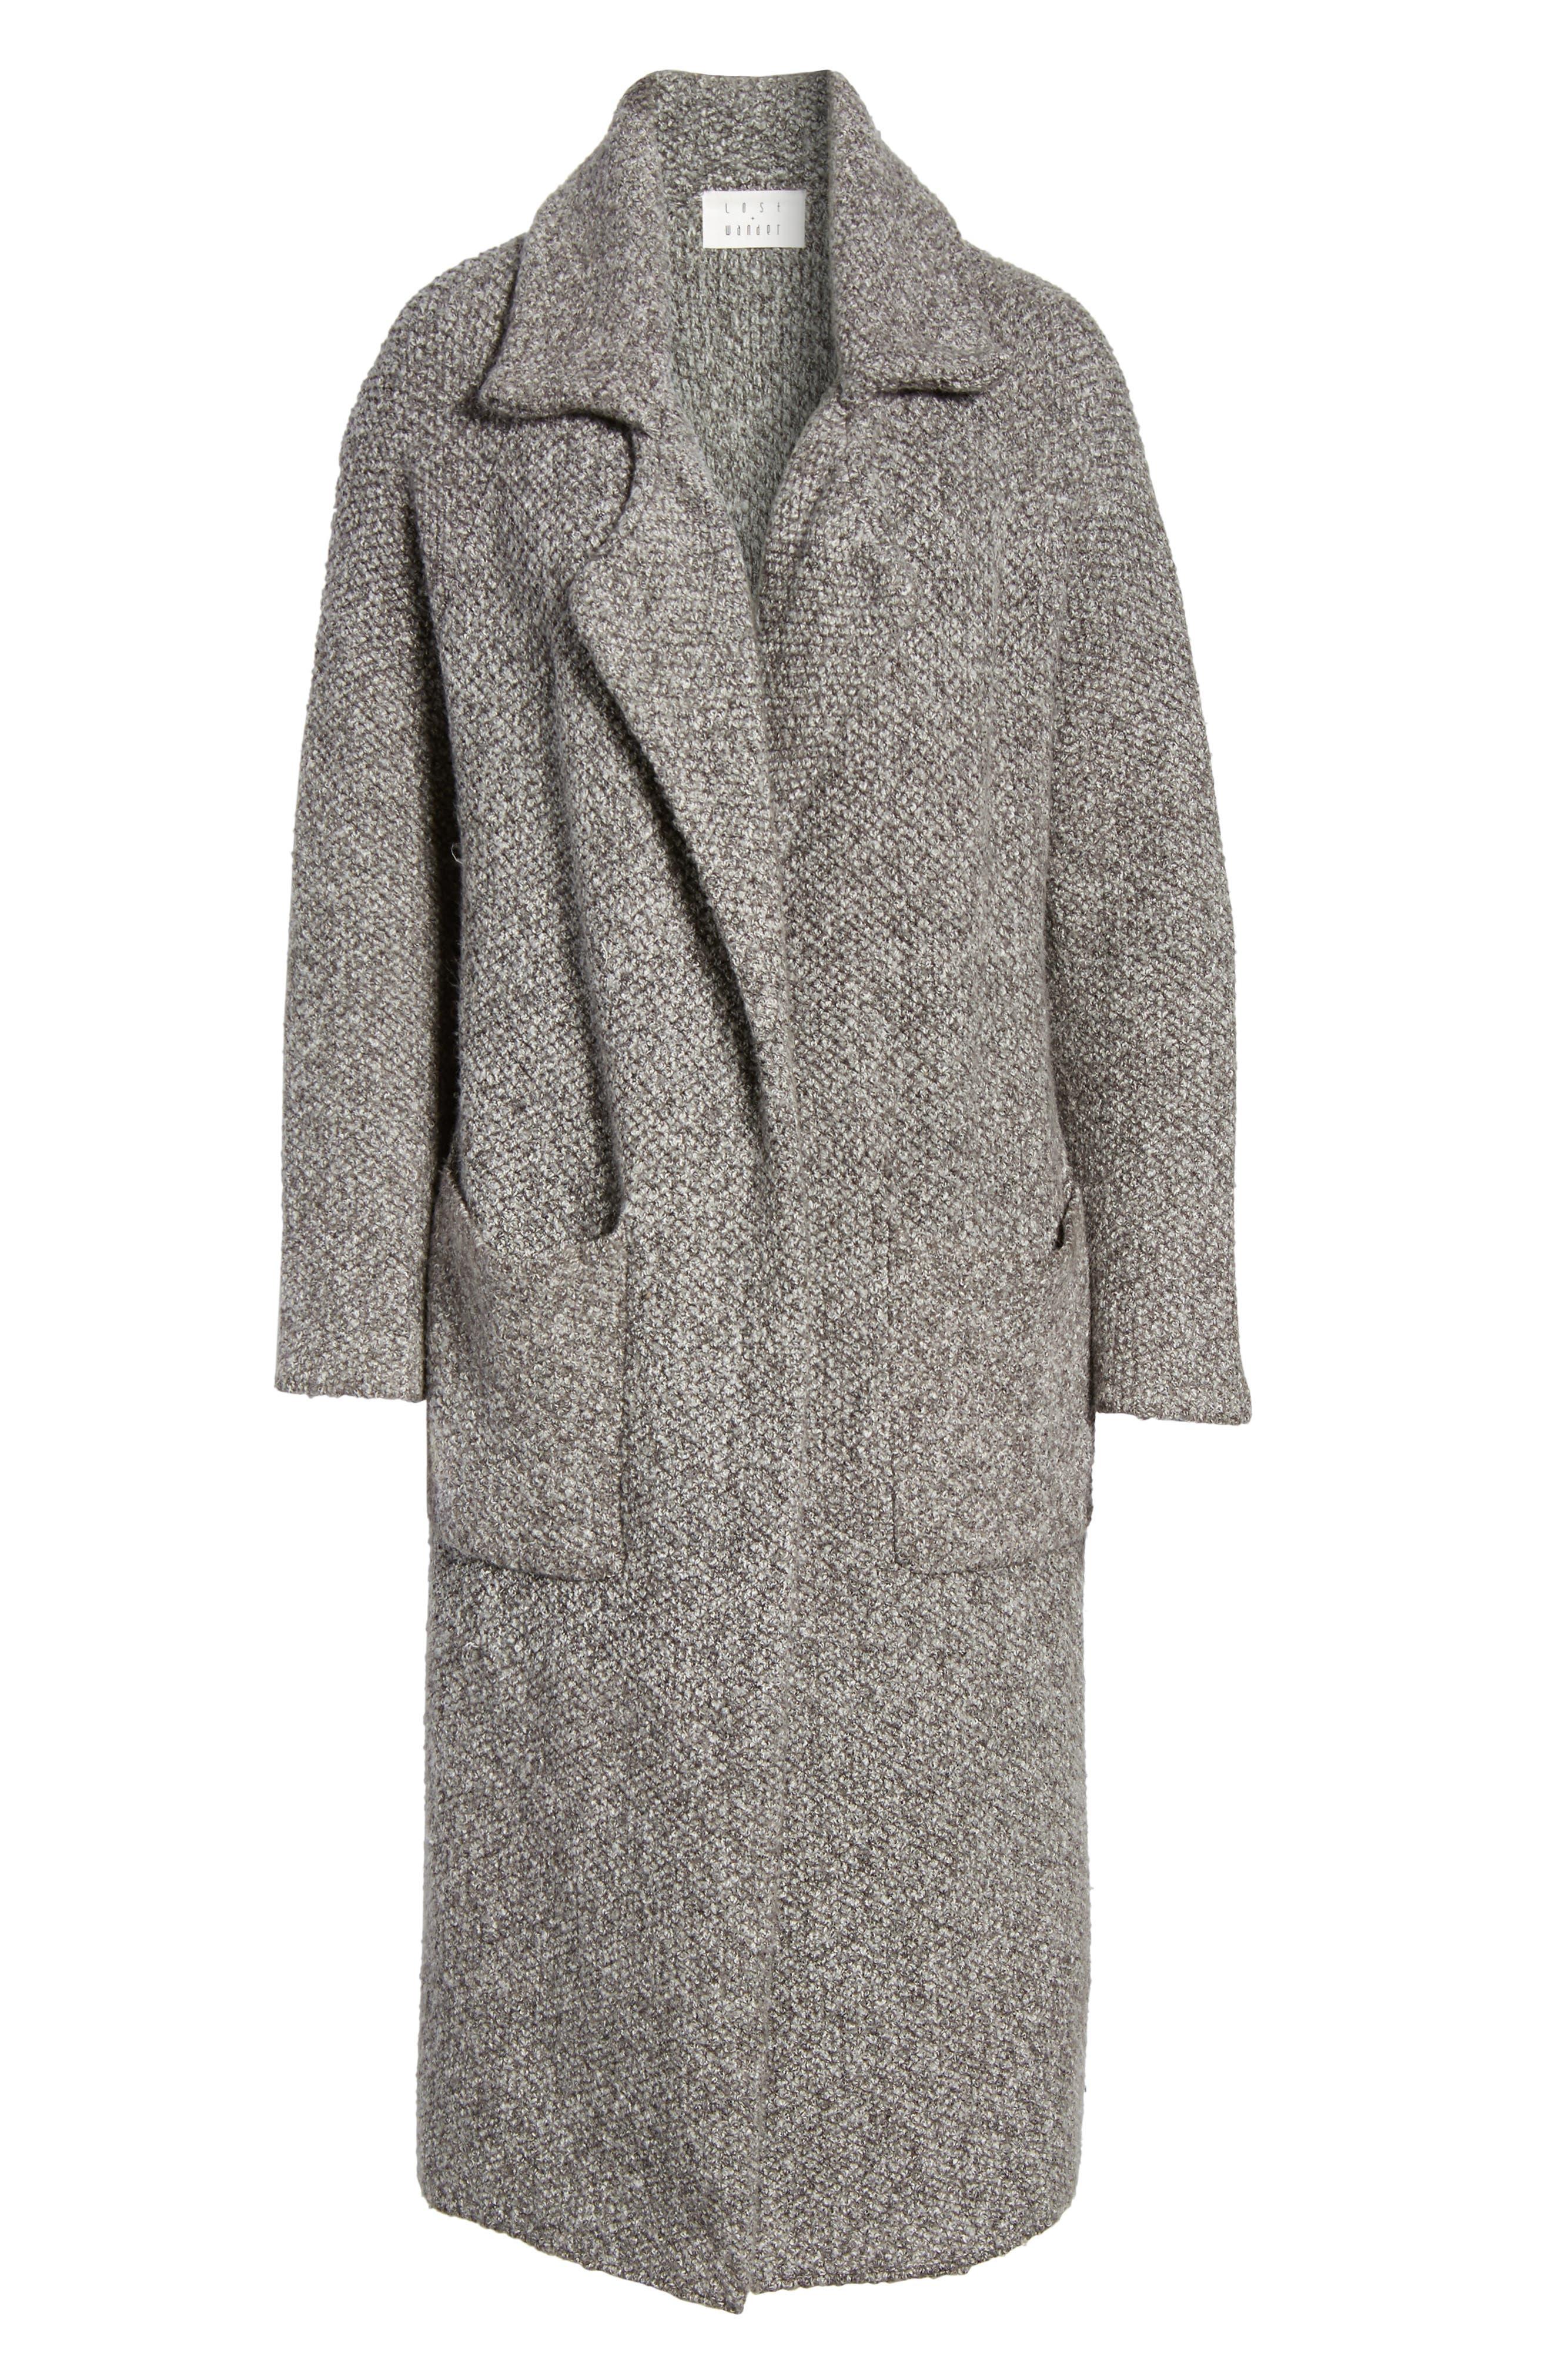 Kala Knit Sweater Jacket,                             Alternate thumbnail 6, color,                             Grey